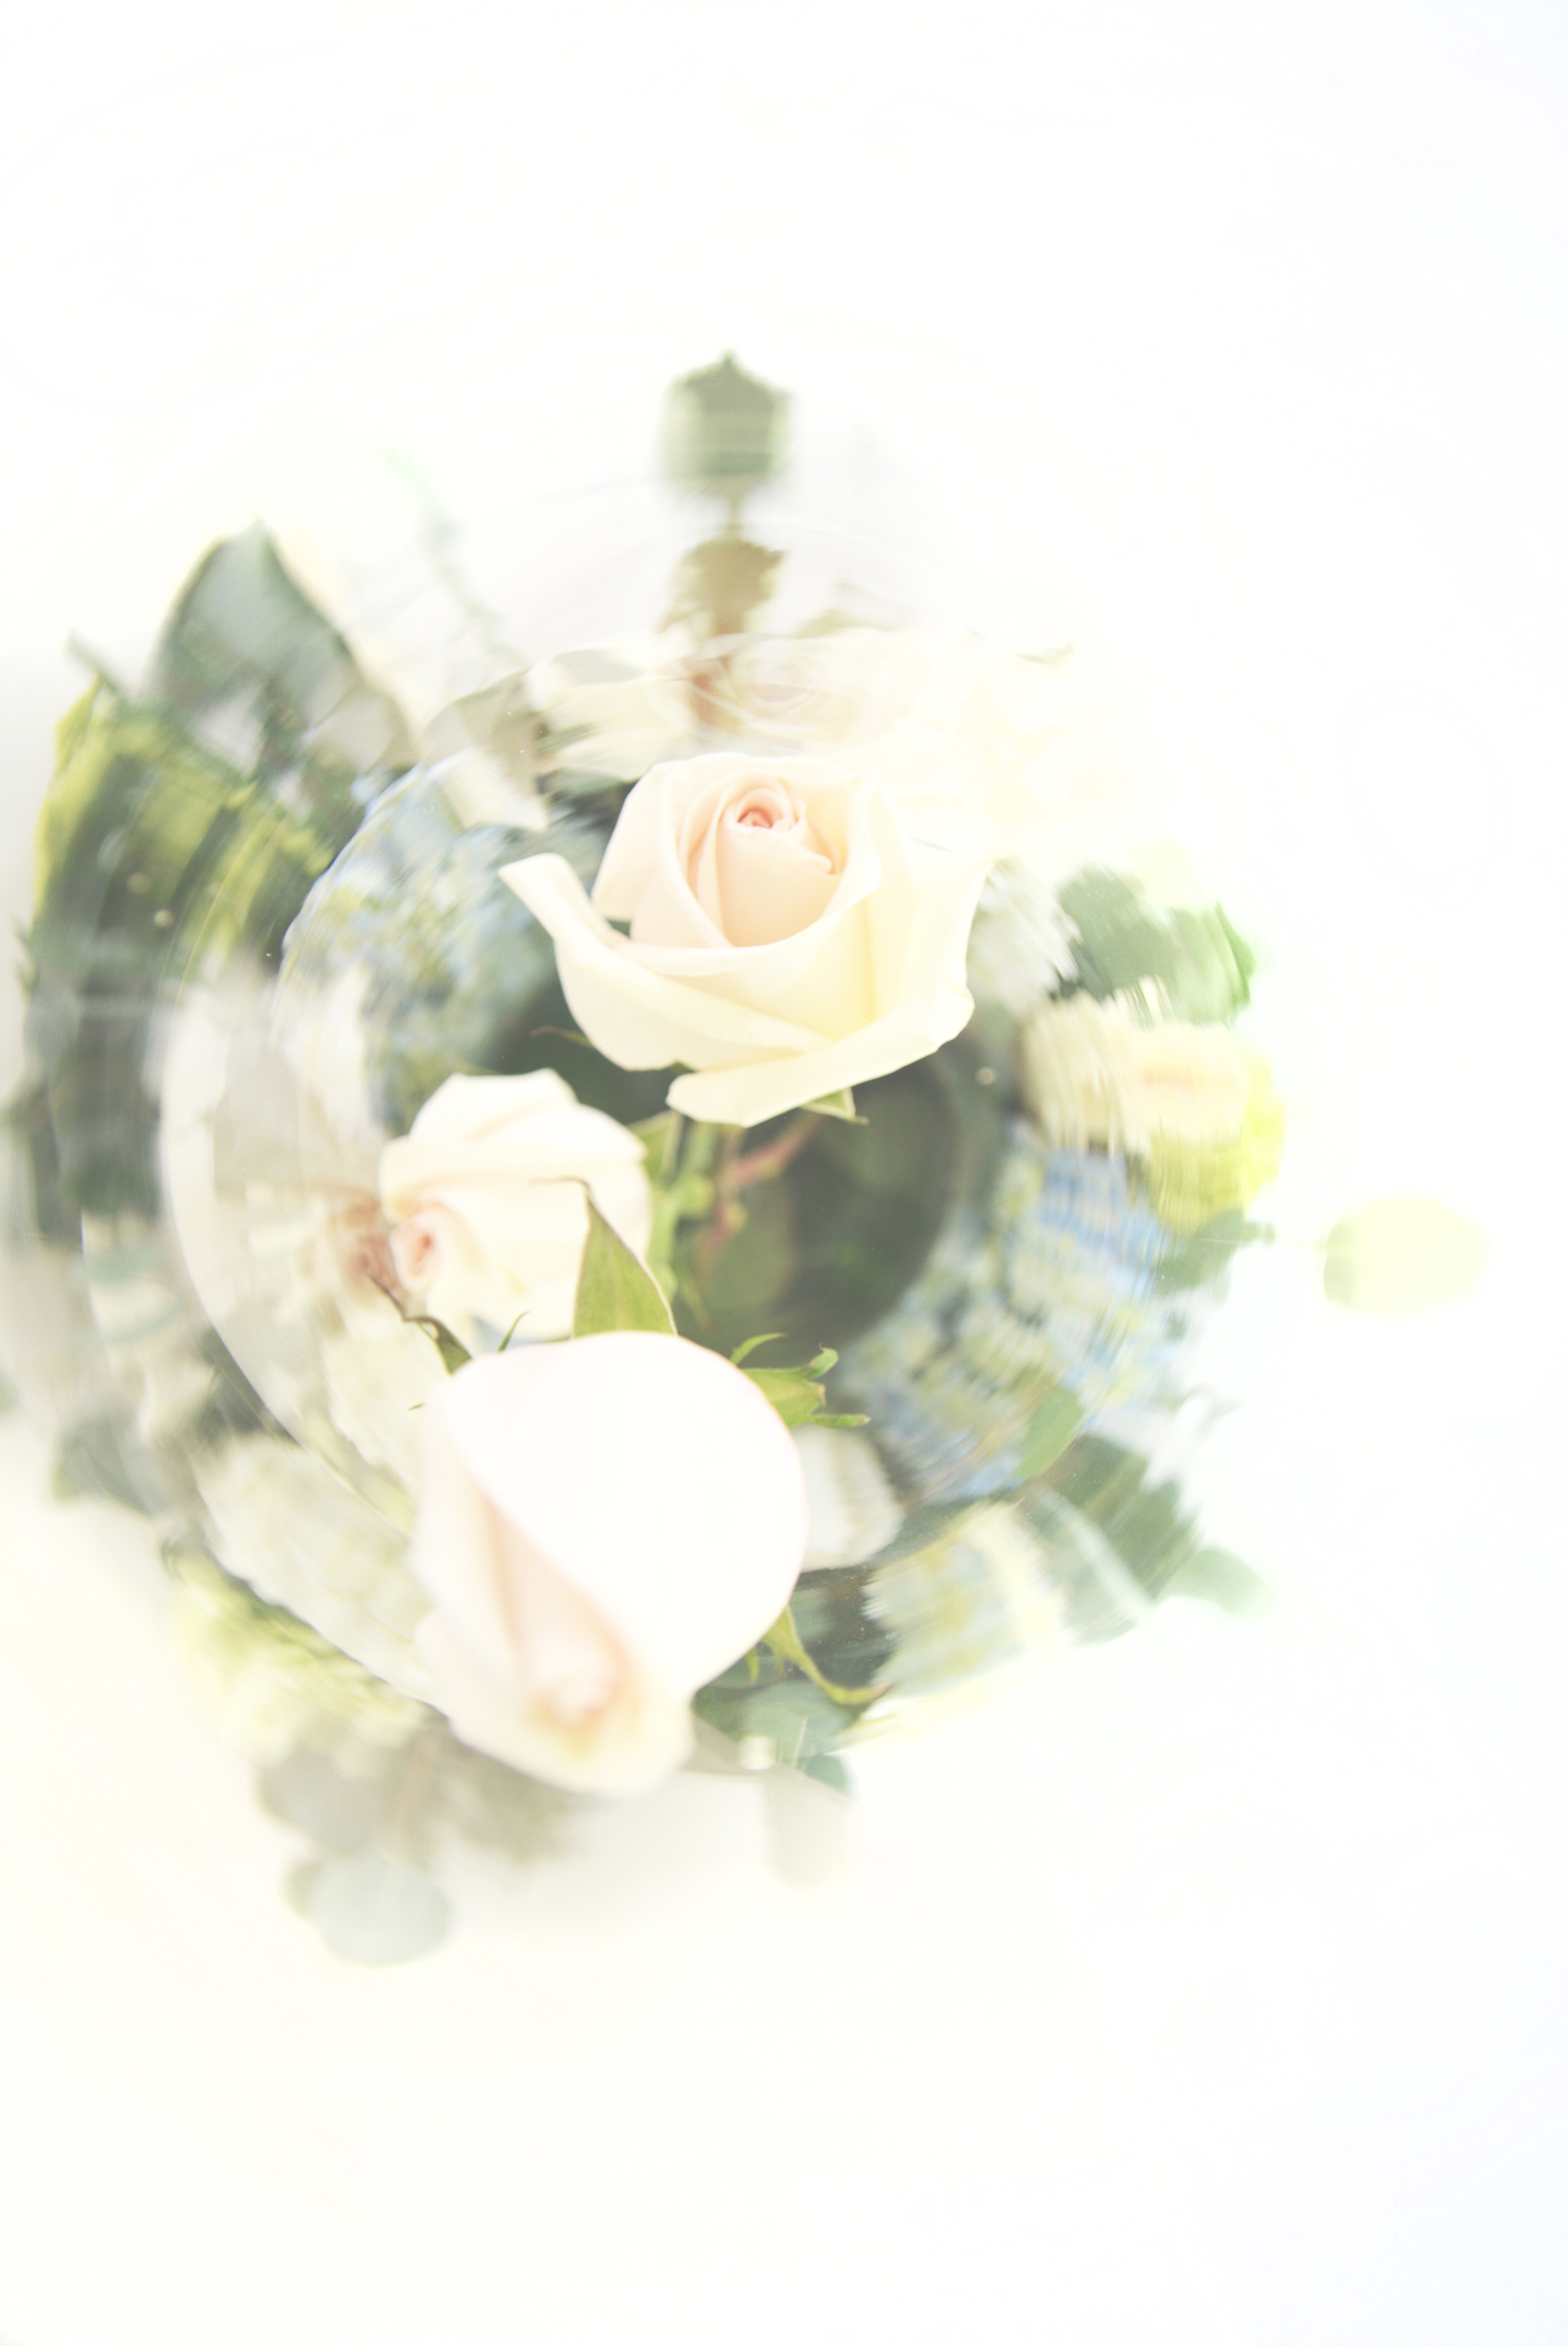 The Brady Inn Wedding Photography - Six Hearts Photography006